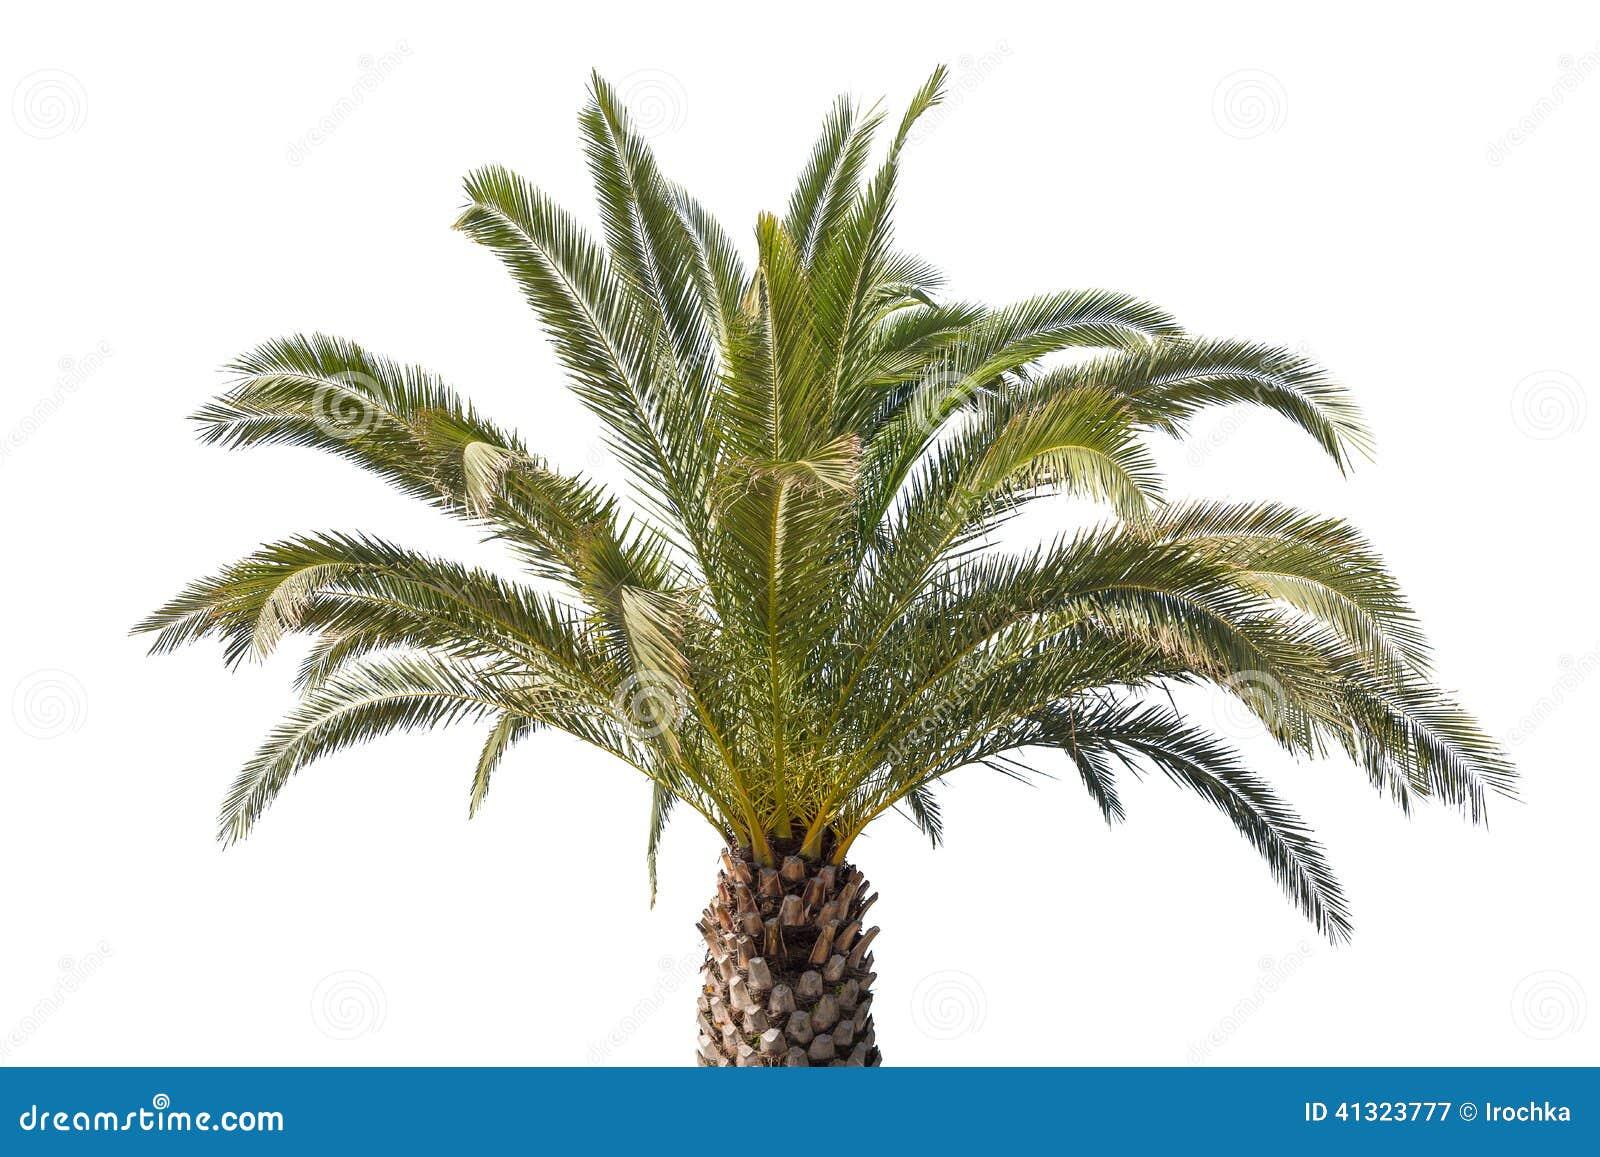 palm tree white - photo #14